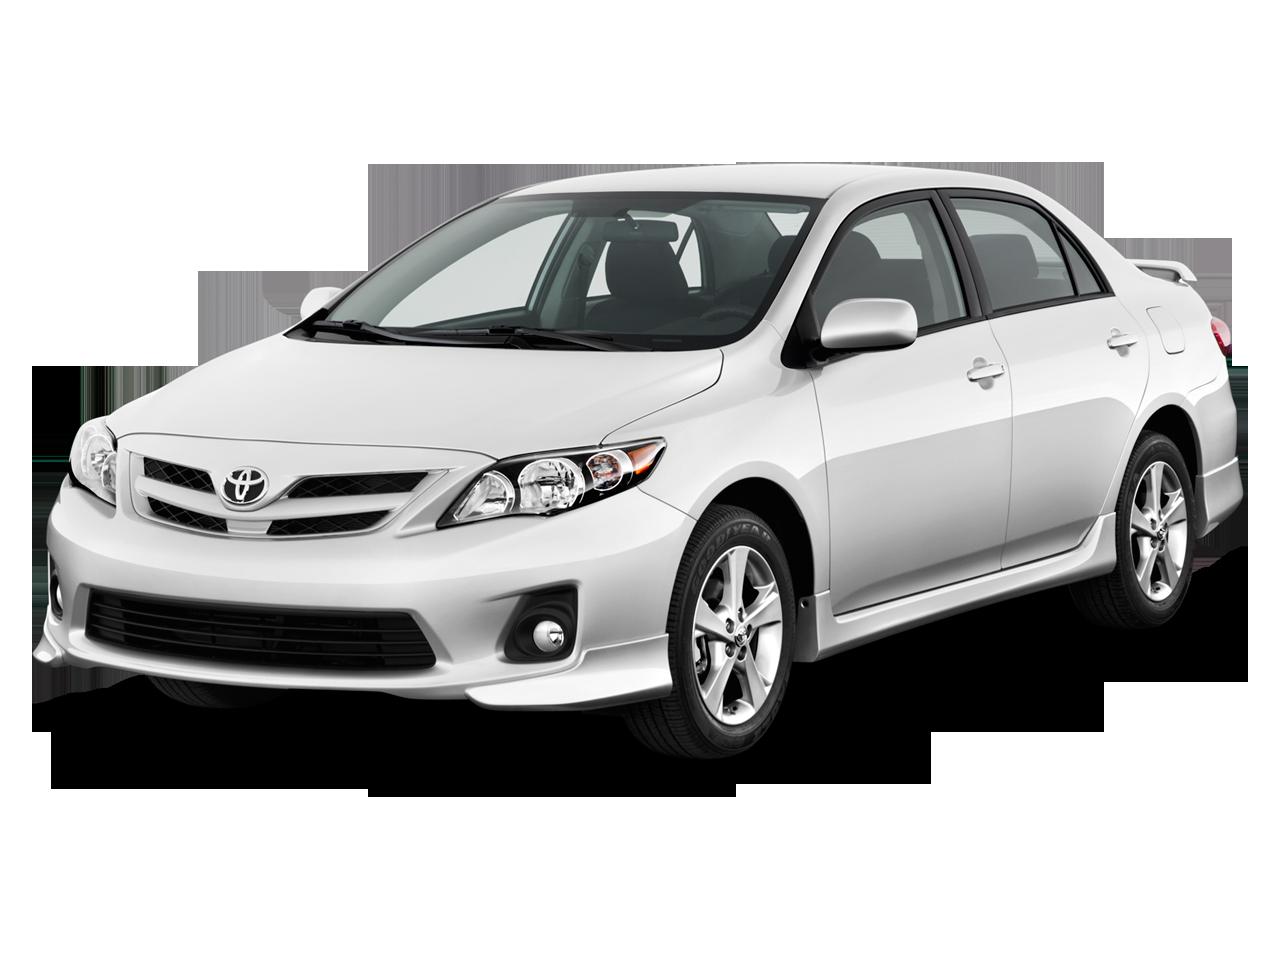 toyota png image free car image